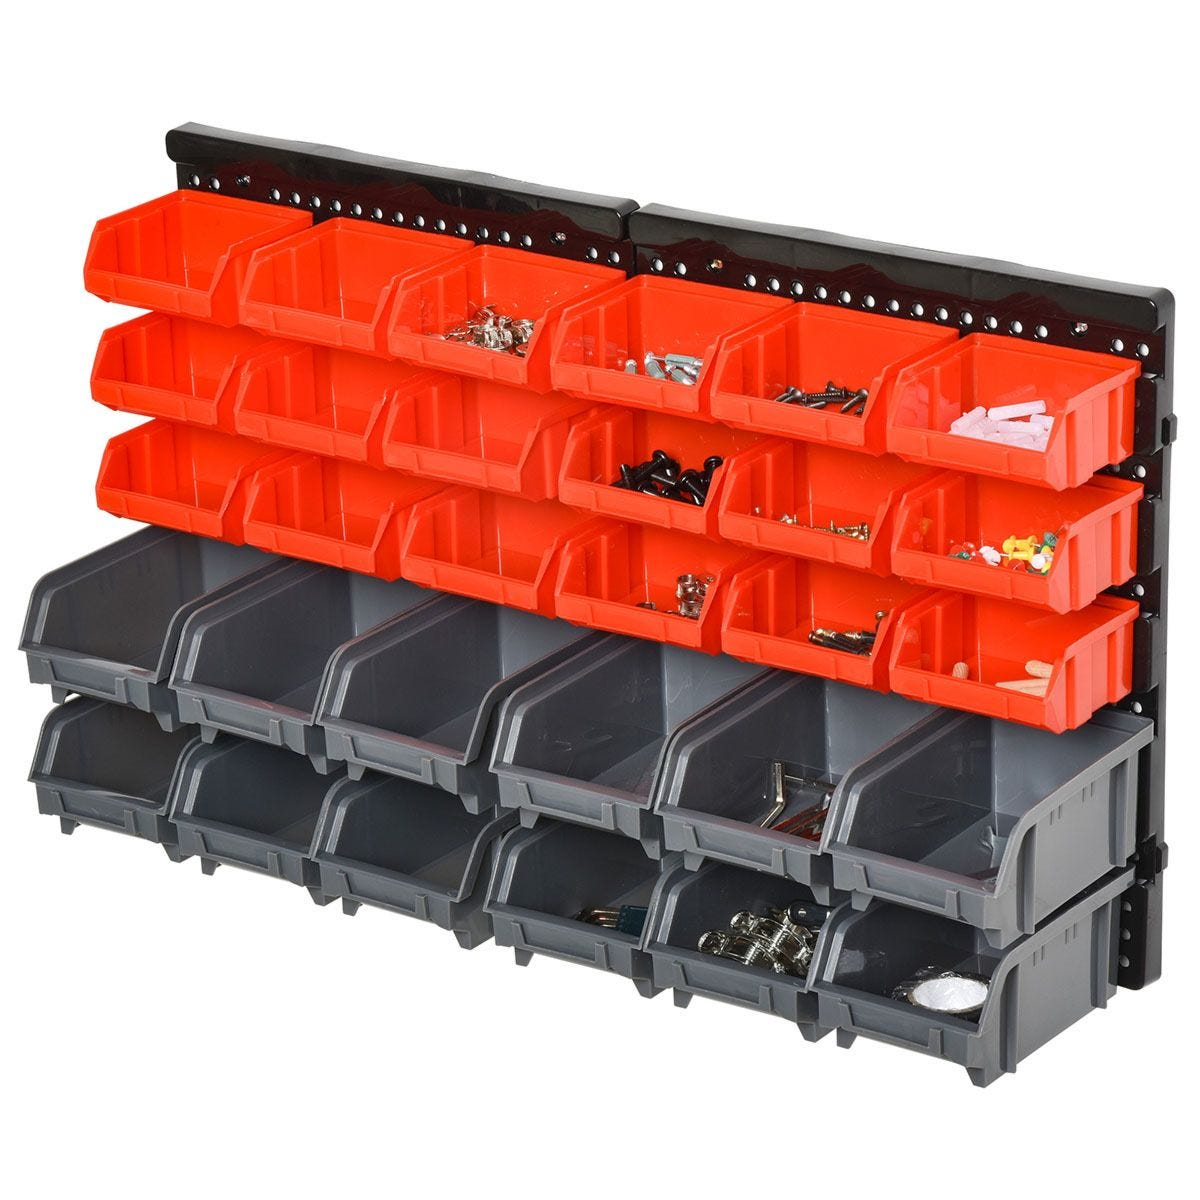 Durhand 30 Cubbie On-Wall Storage Board Tool Screw Organiser with Screw Kit - Grey & Red